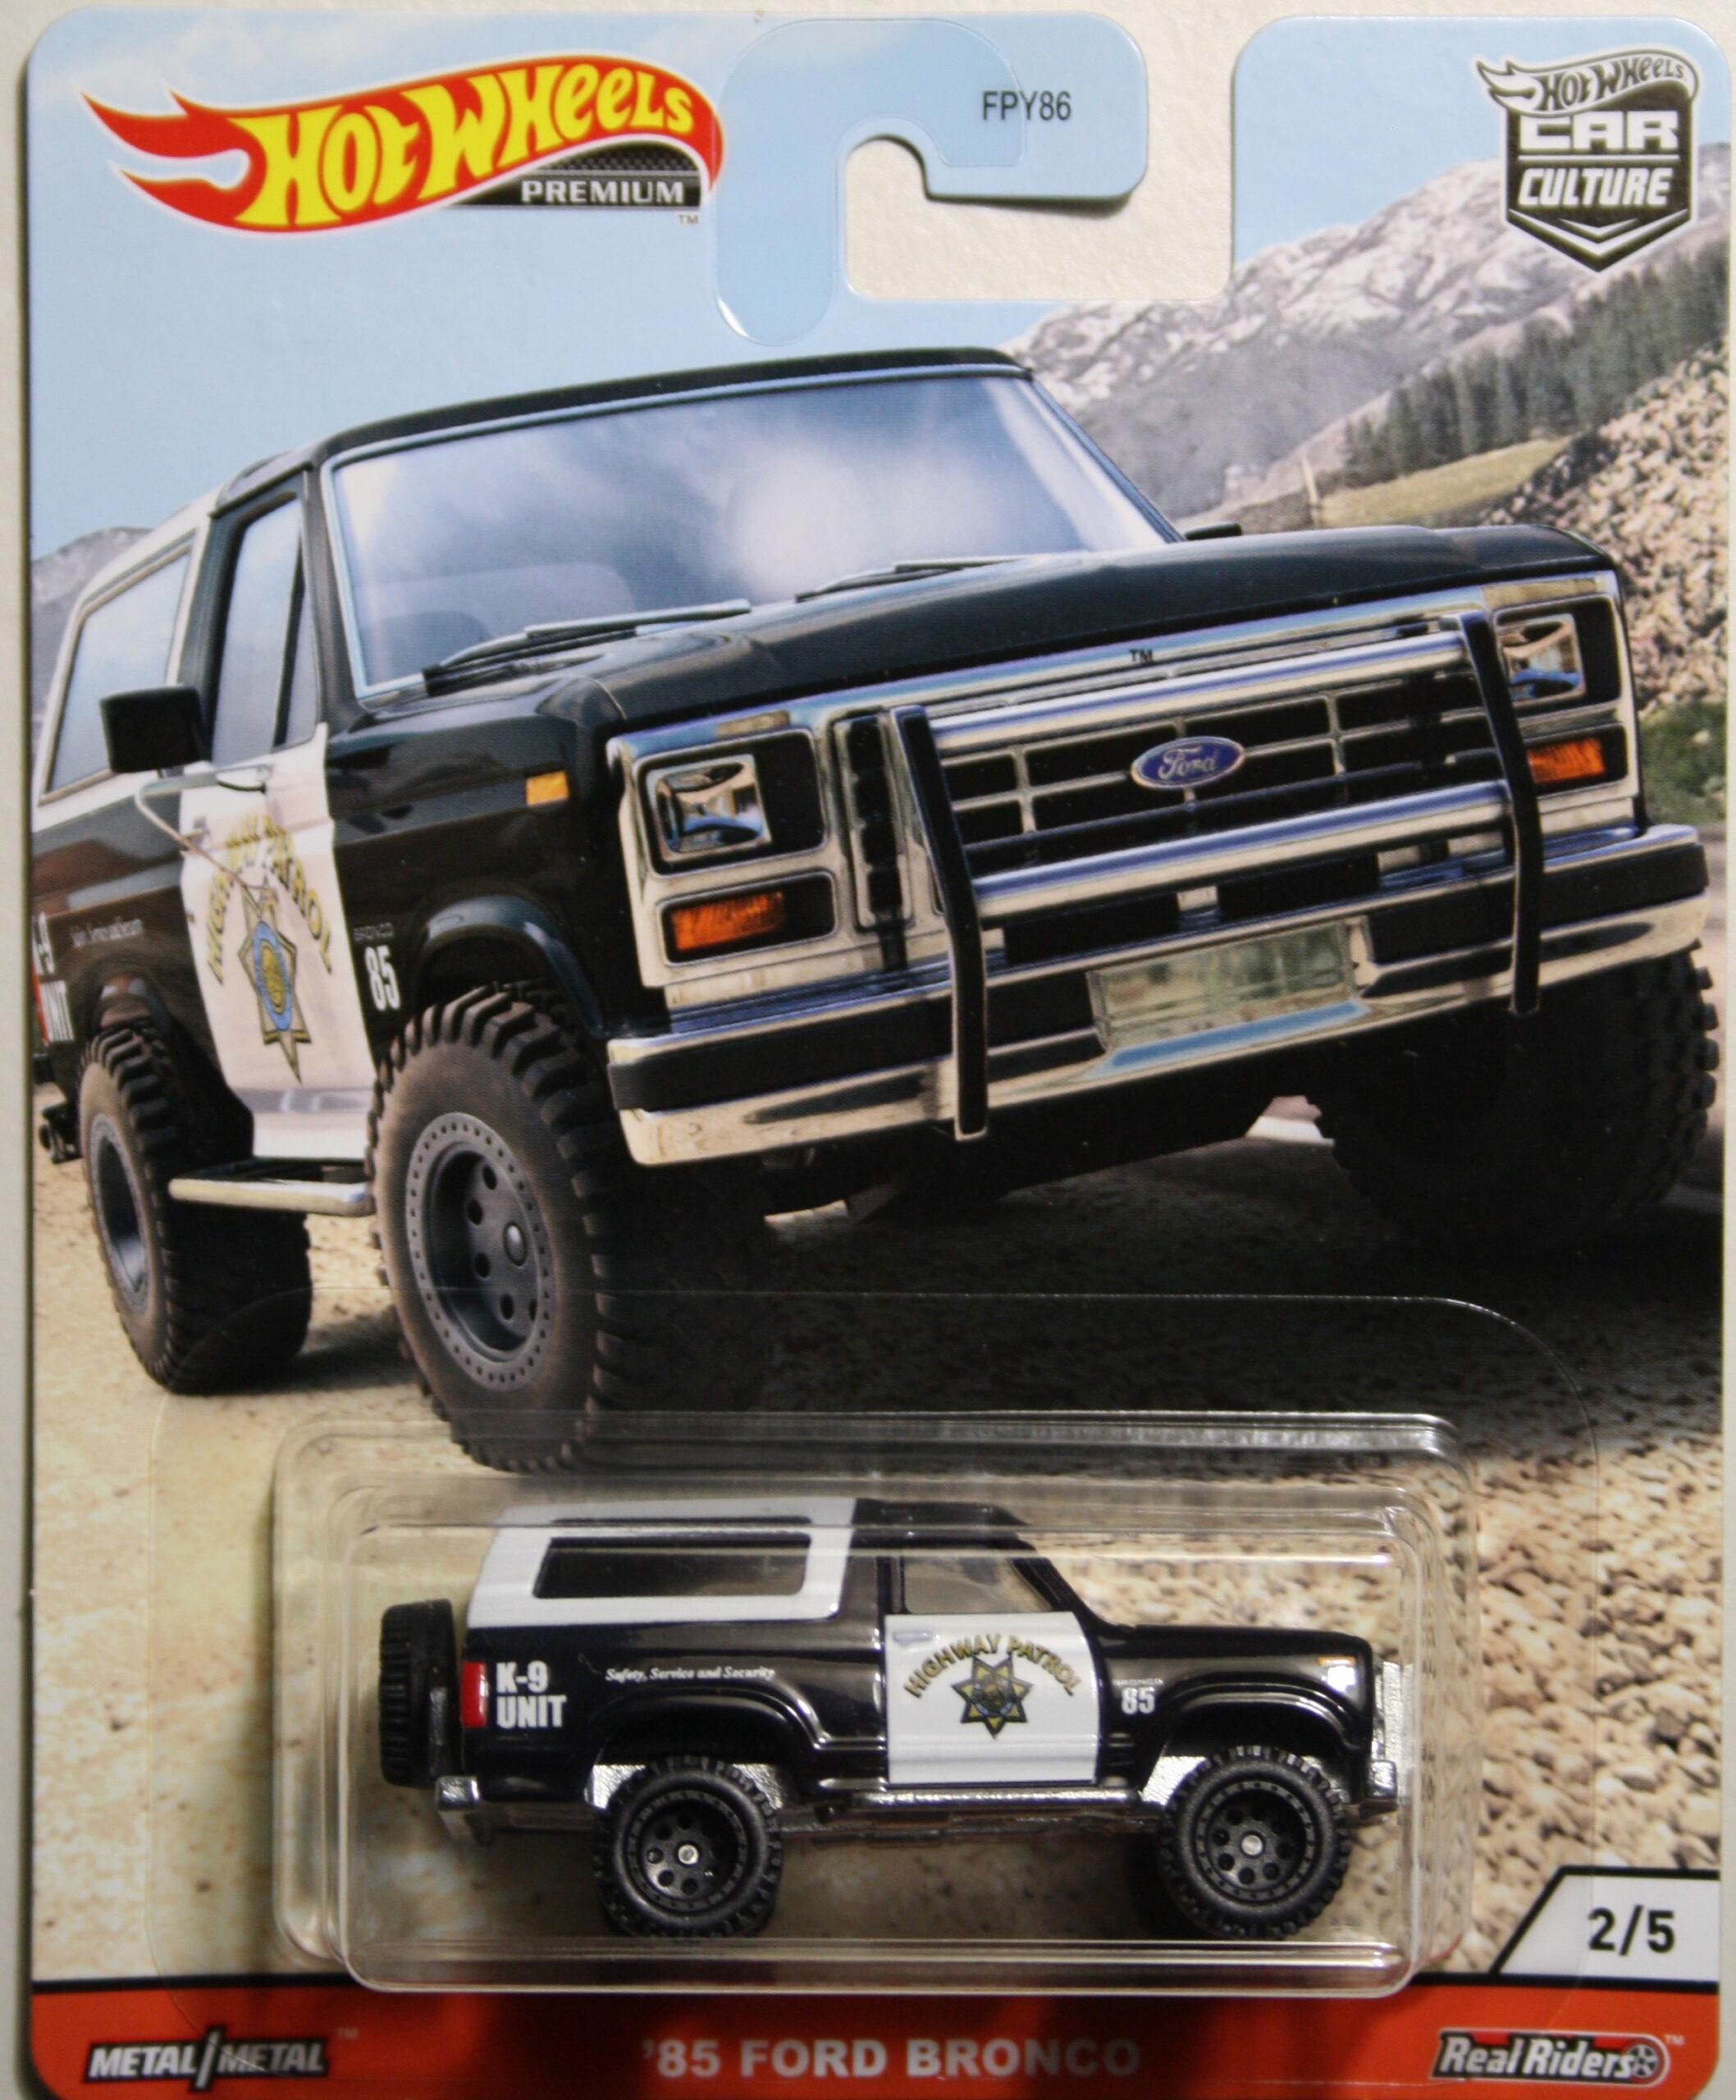 Hot Wheels Car Culture 85 Ford Bronco Highway Patrol